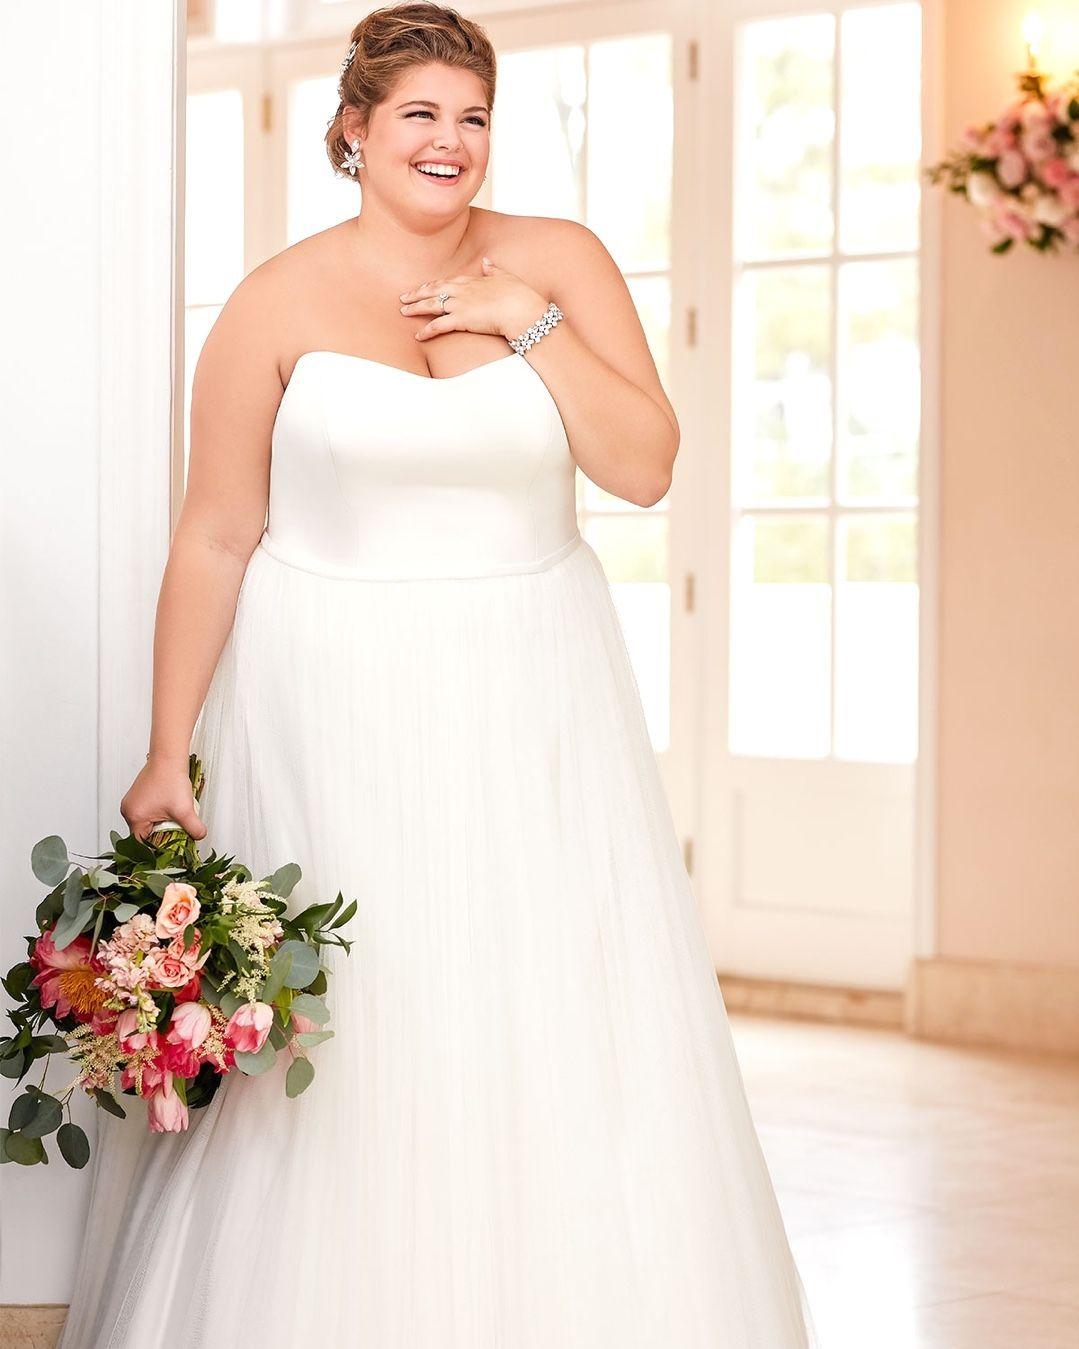 Rose Gold Sequin Bridesmaid Dresses Stella York Wedding Dress York Wedding Dress Classic Wedding Dress [ 1349 x 1079 Pixel ]